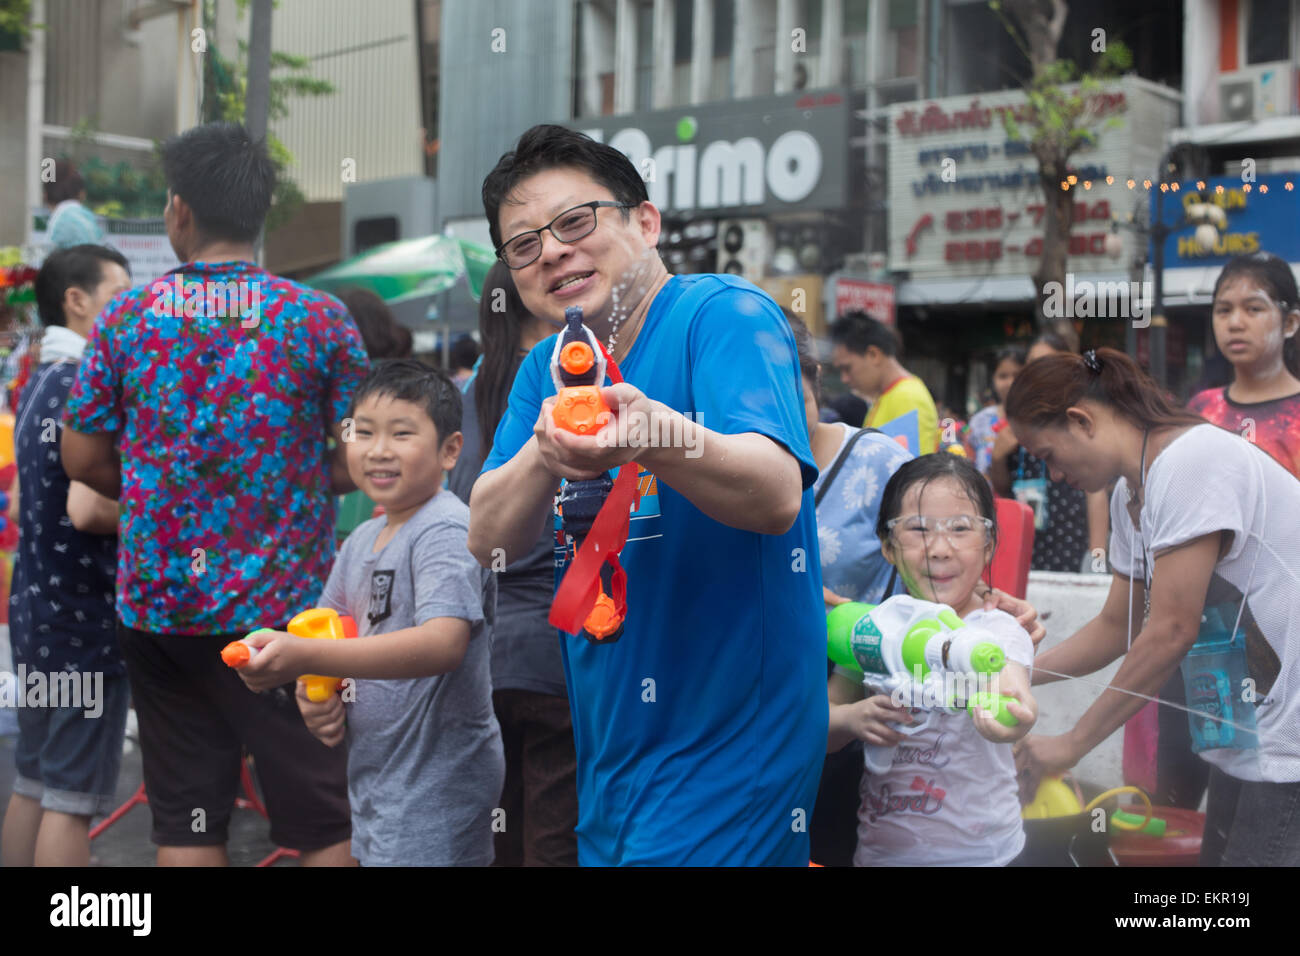 Bangkok, Thailand. 13th April, 2015. A family takes part in the annual Songkran festival on Silom Road, Bangkok - Stock Image